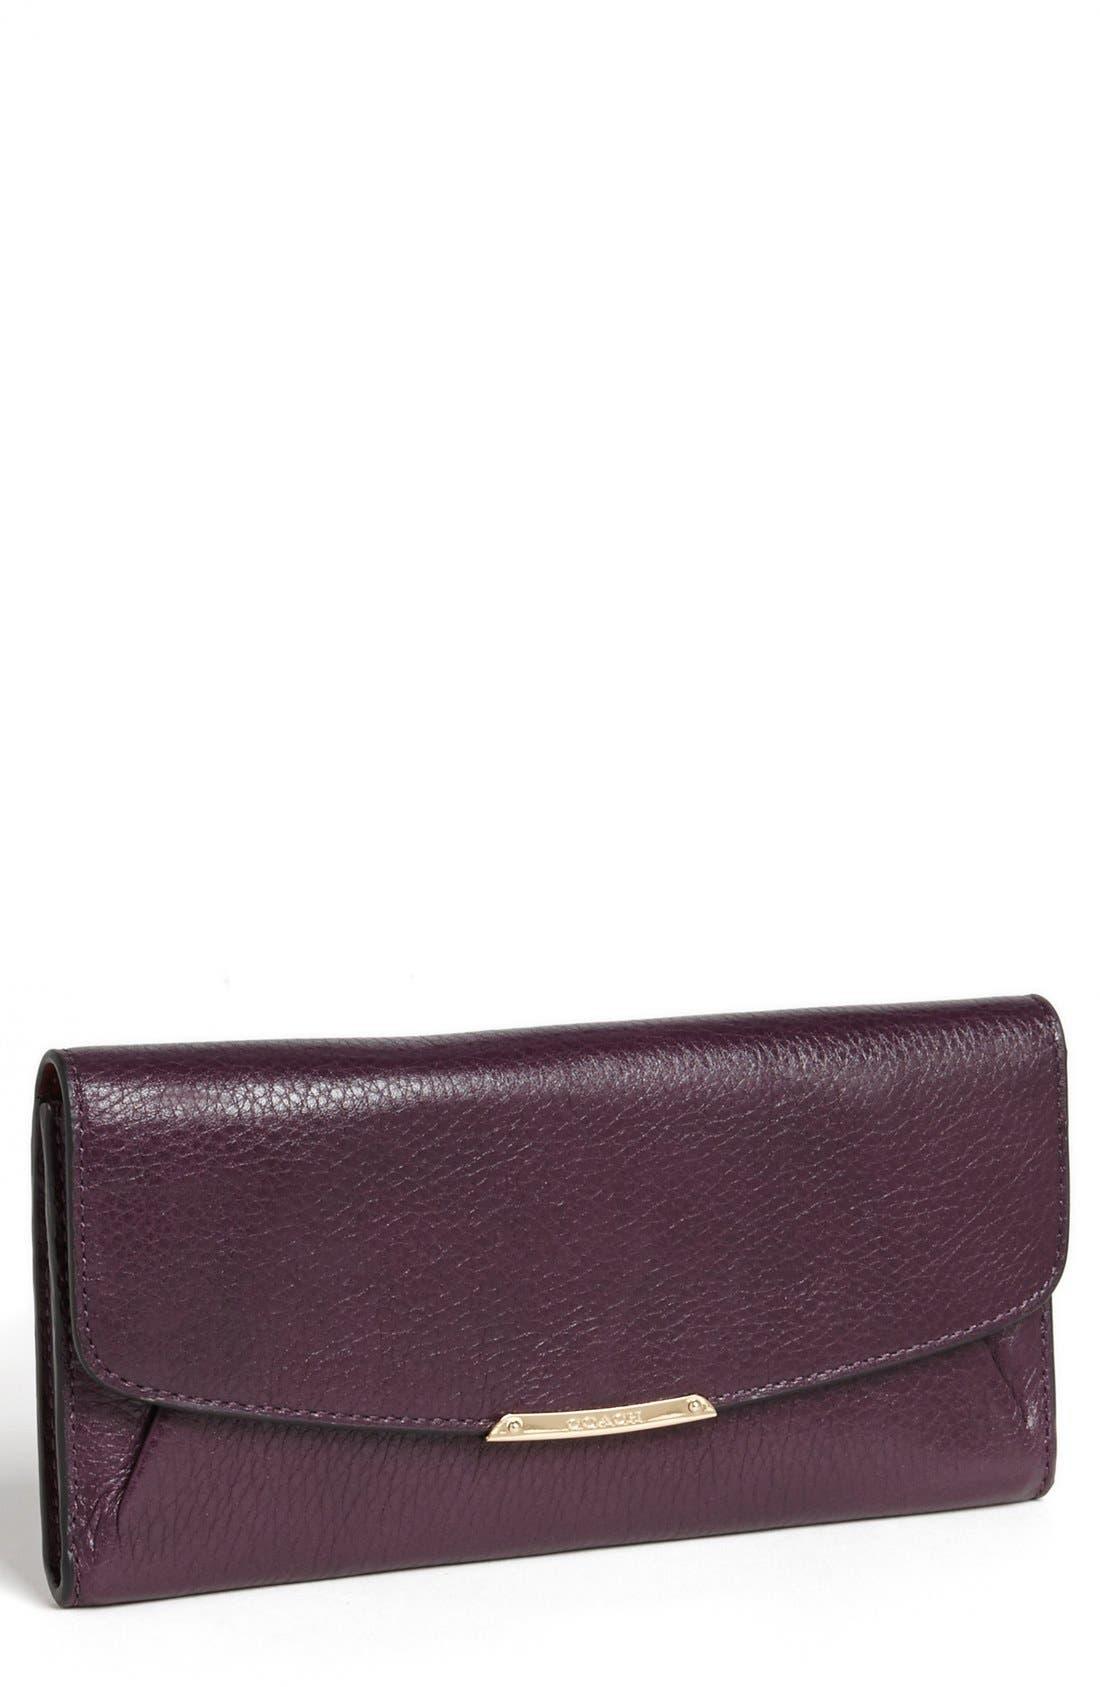 Main Image - COACH 'Madison' Leather Envelope Wallet